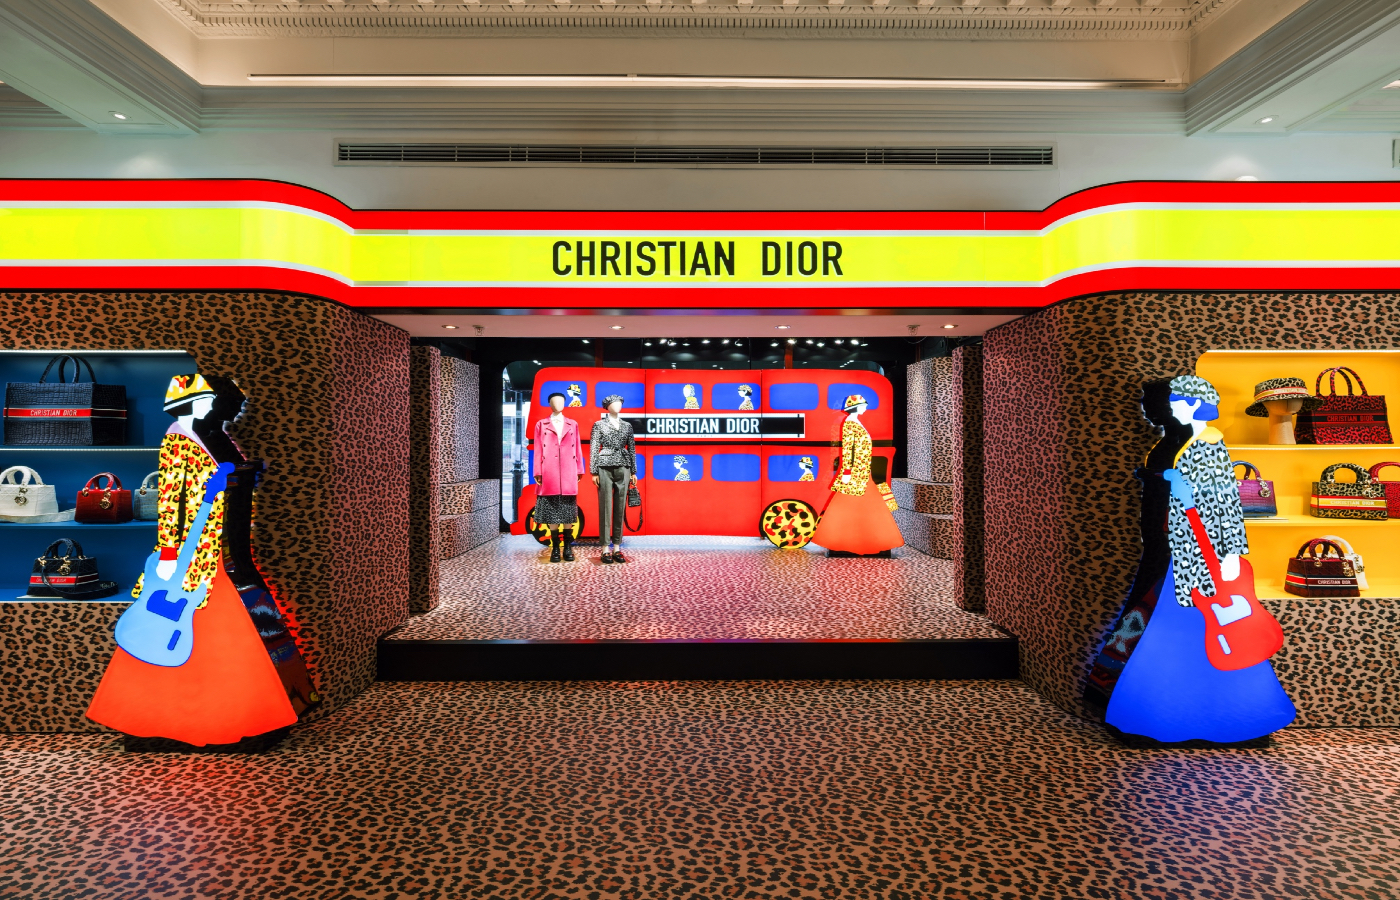 Dior Pop-up in London's Harrods